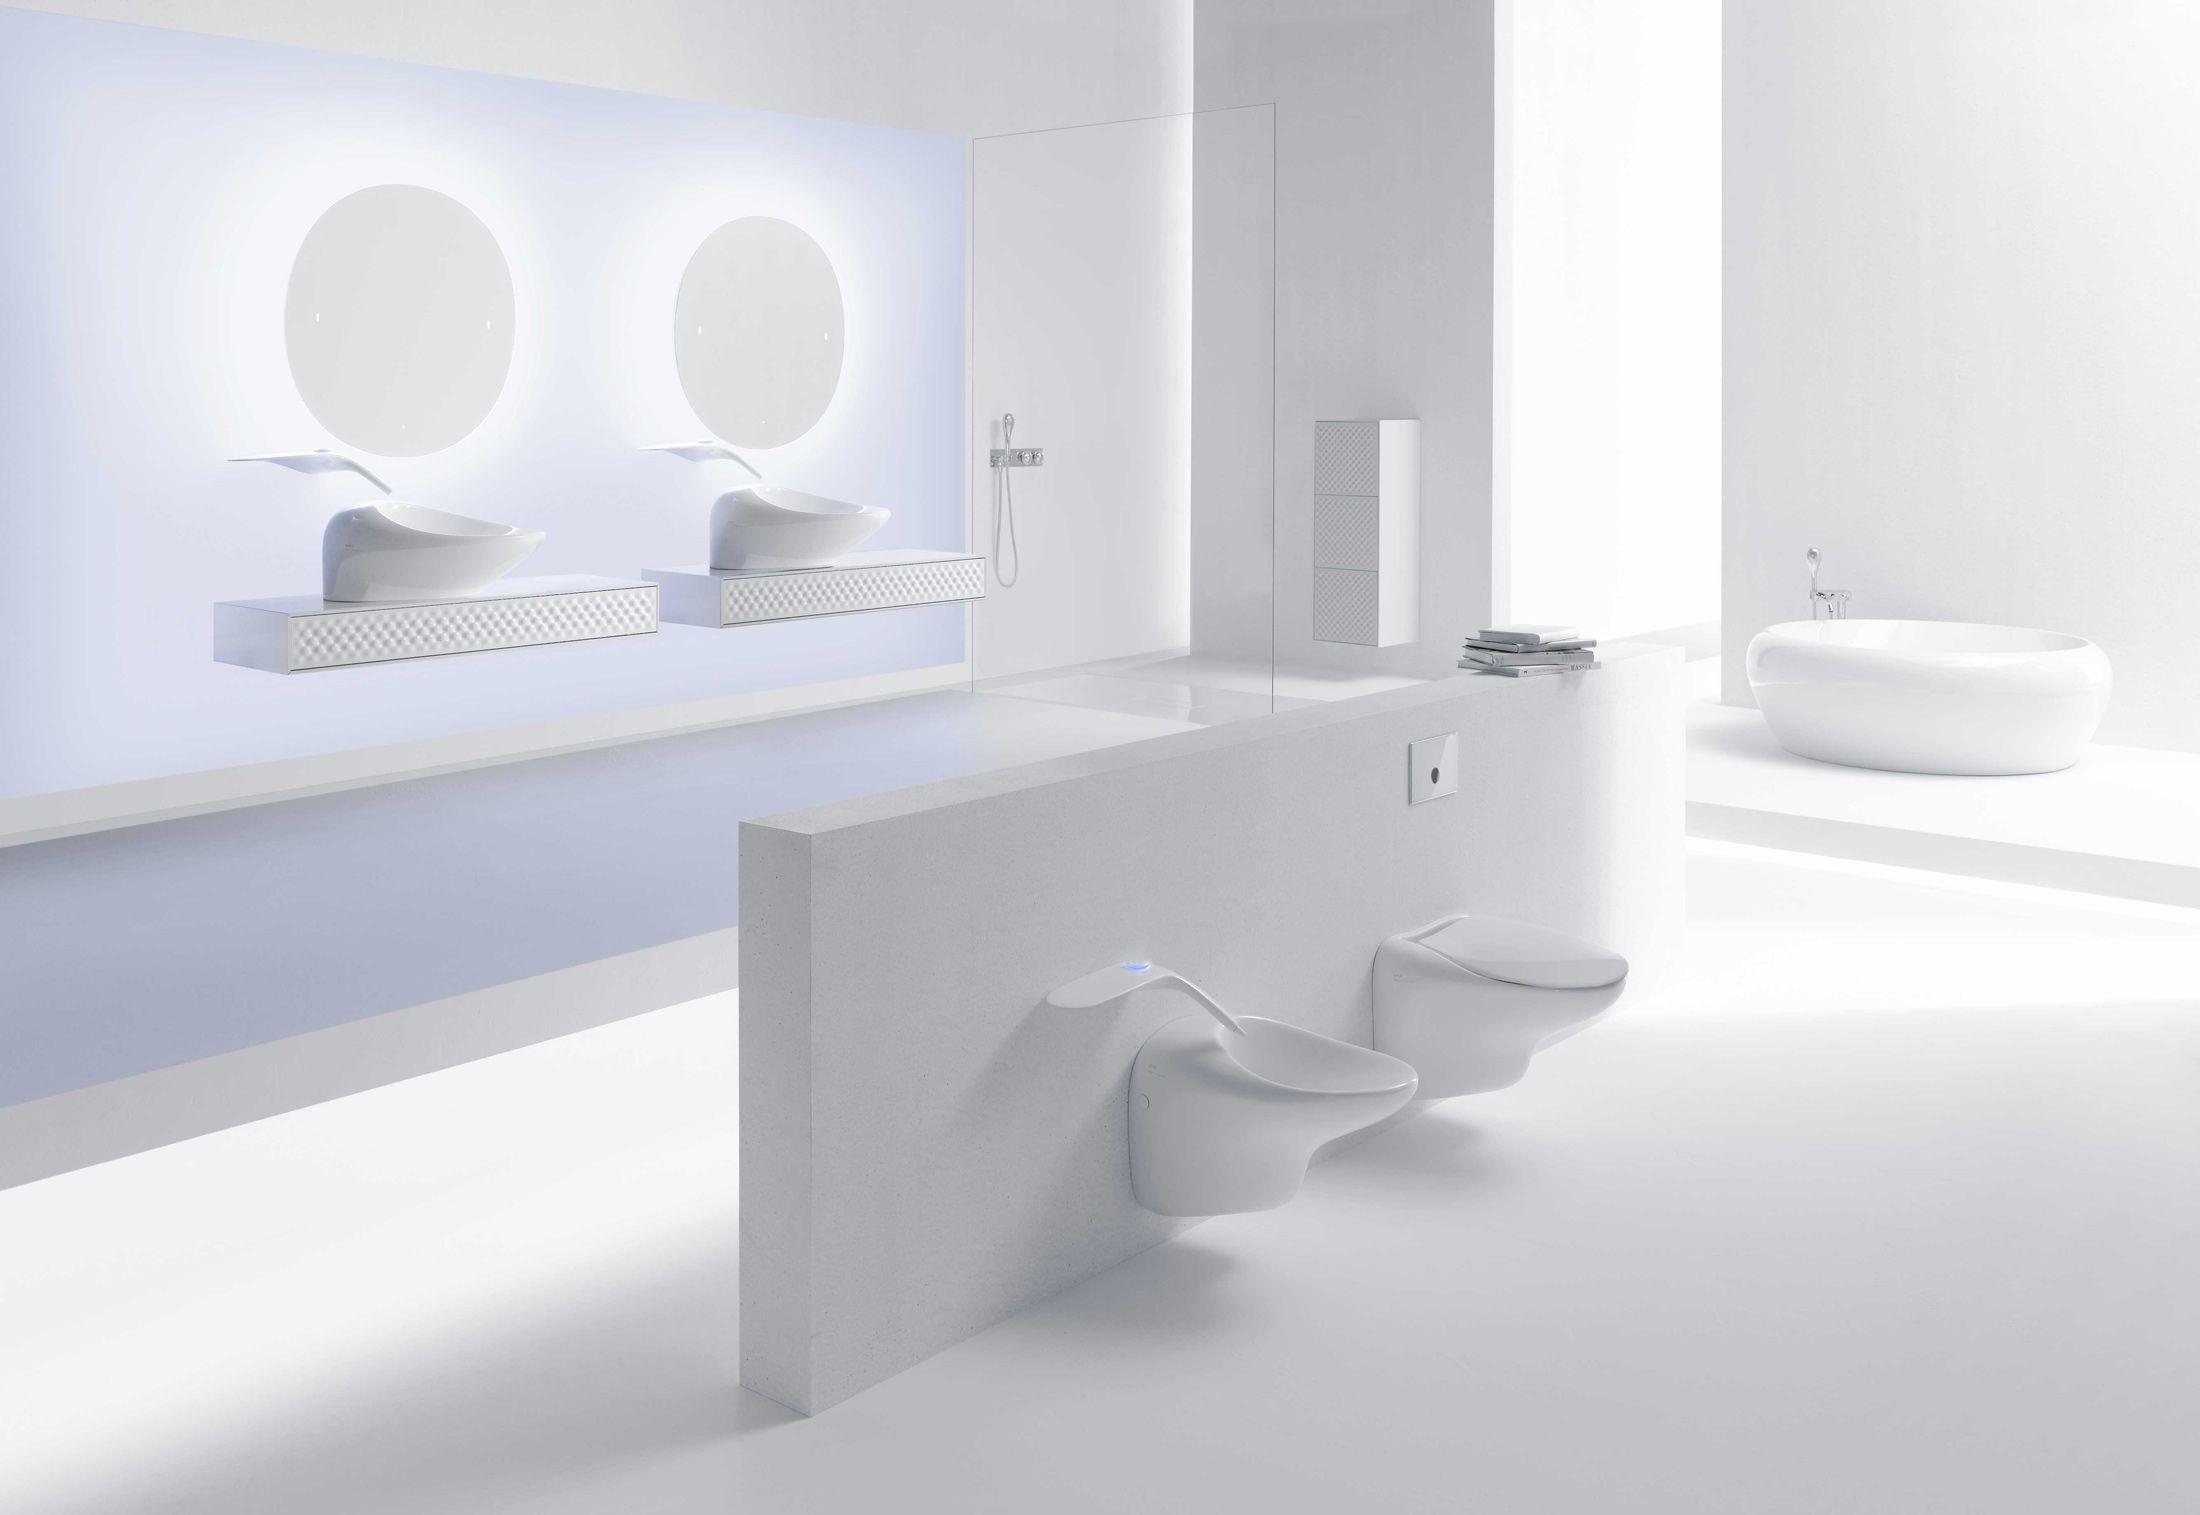 Lovely Ross Lovegrove VitrA Bathroom Freedom WC And Bidet